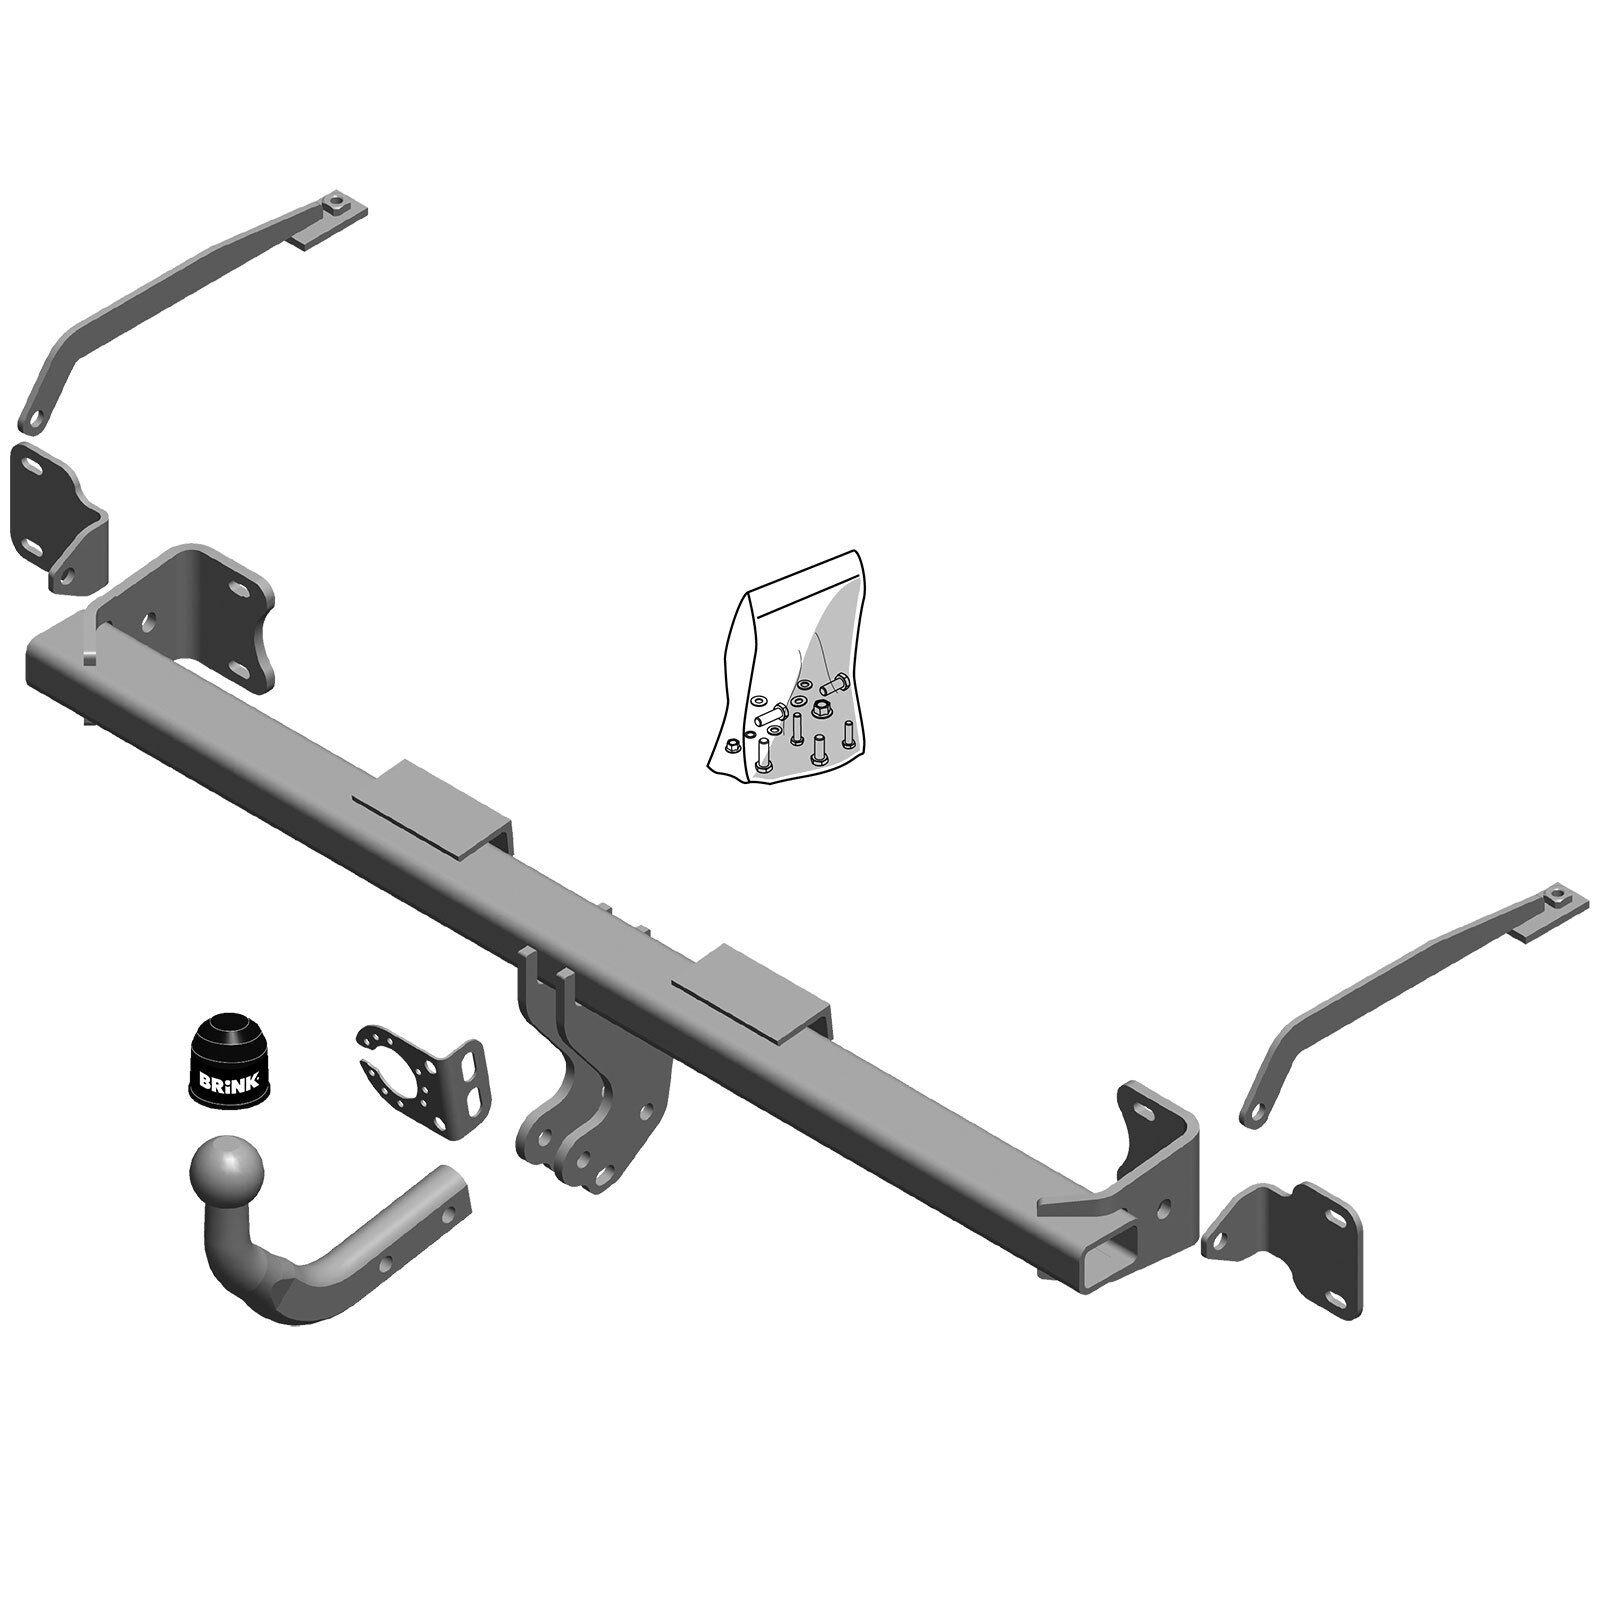 Fixed towbar swan neck Ford Kuga 2008//2013 universal 13-pin electric kit